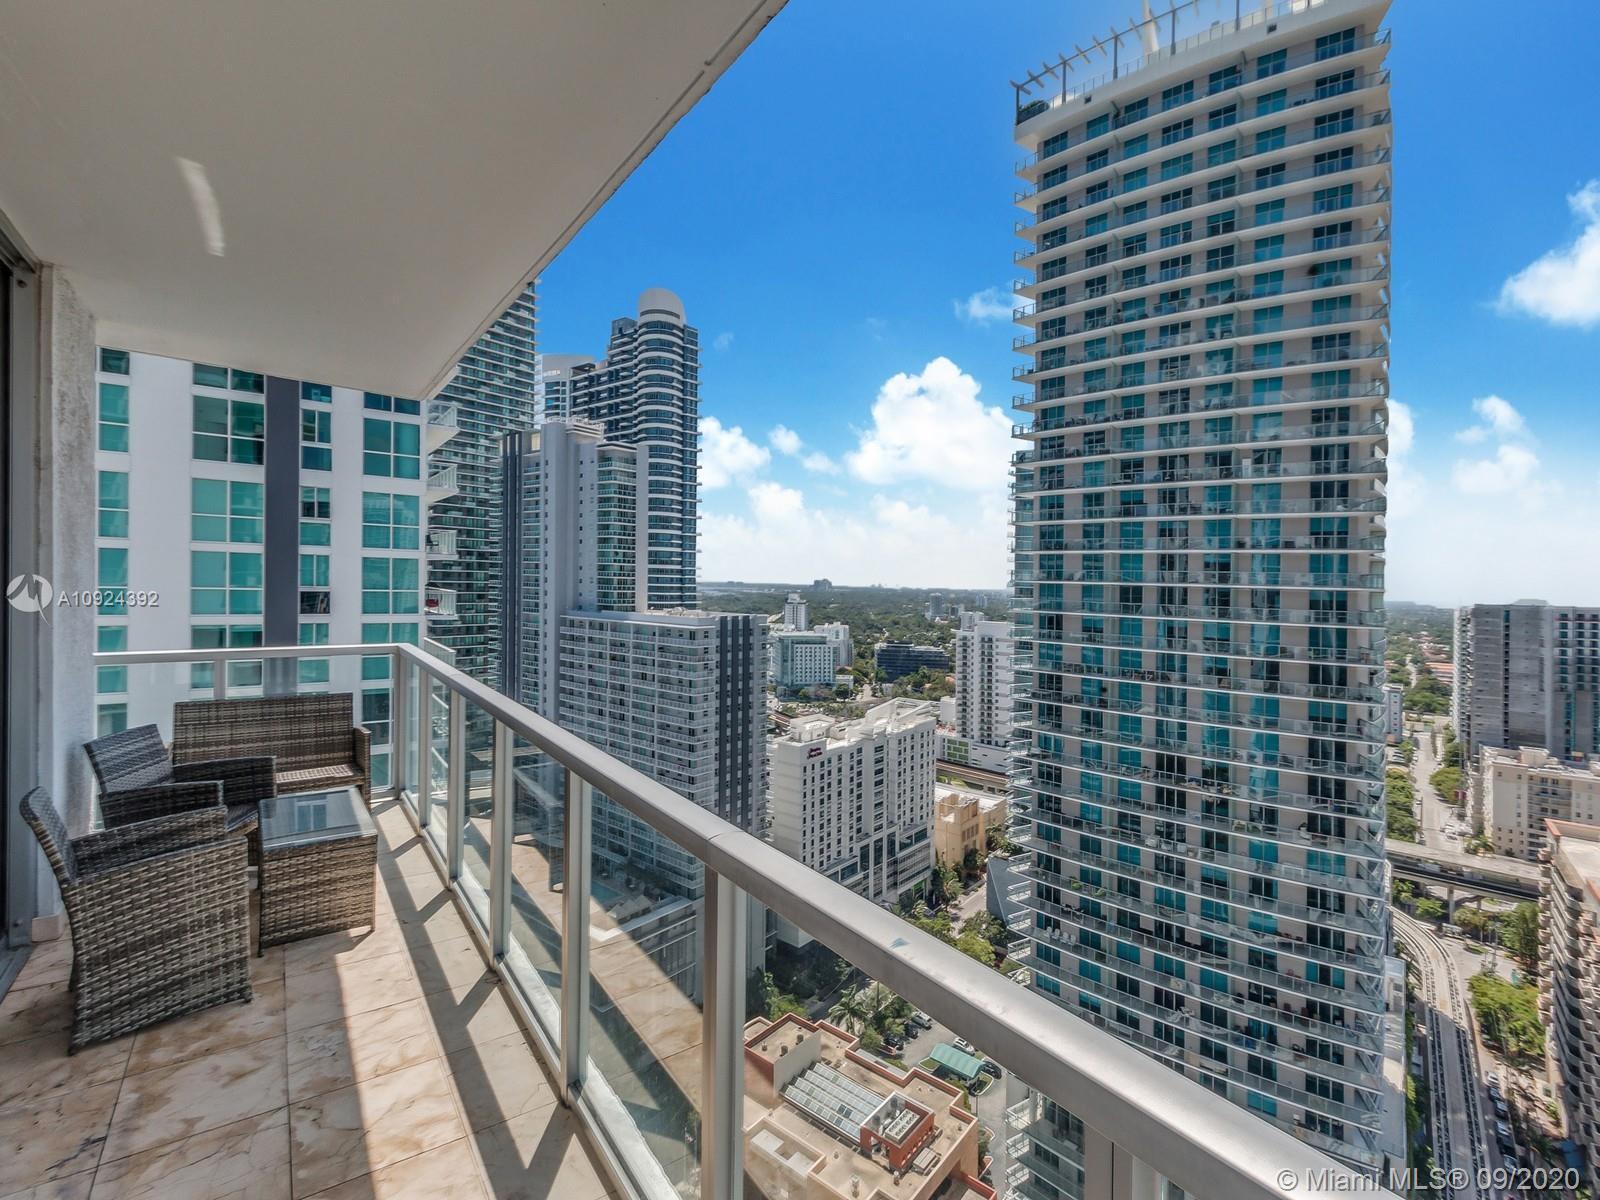 1060 Brickell East Tower #2714 - 1050 Brickell Ave #2714, Miami, FL 33131